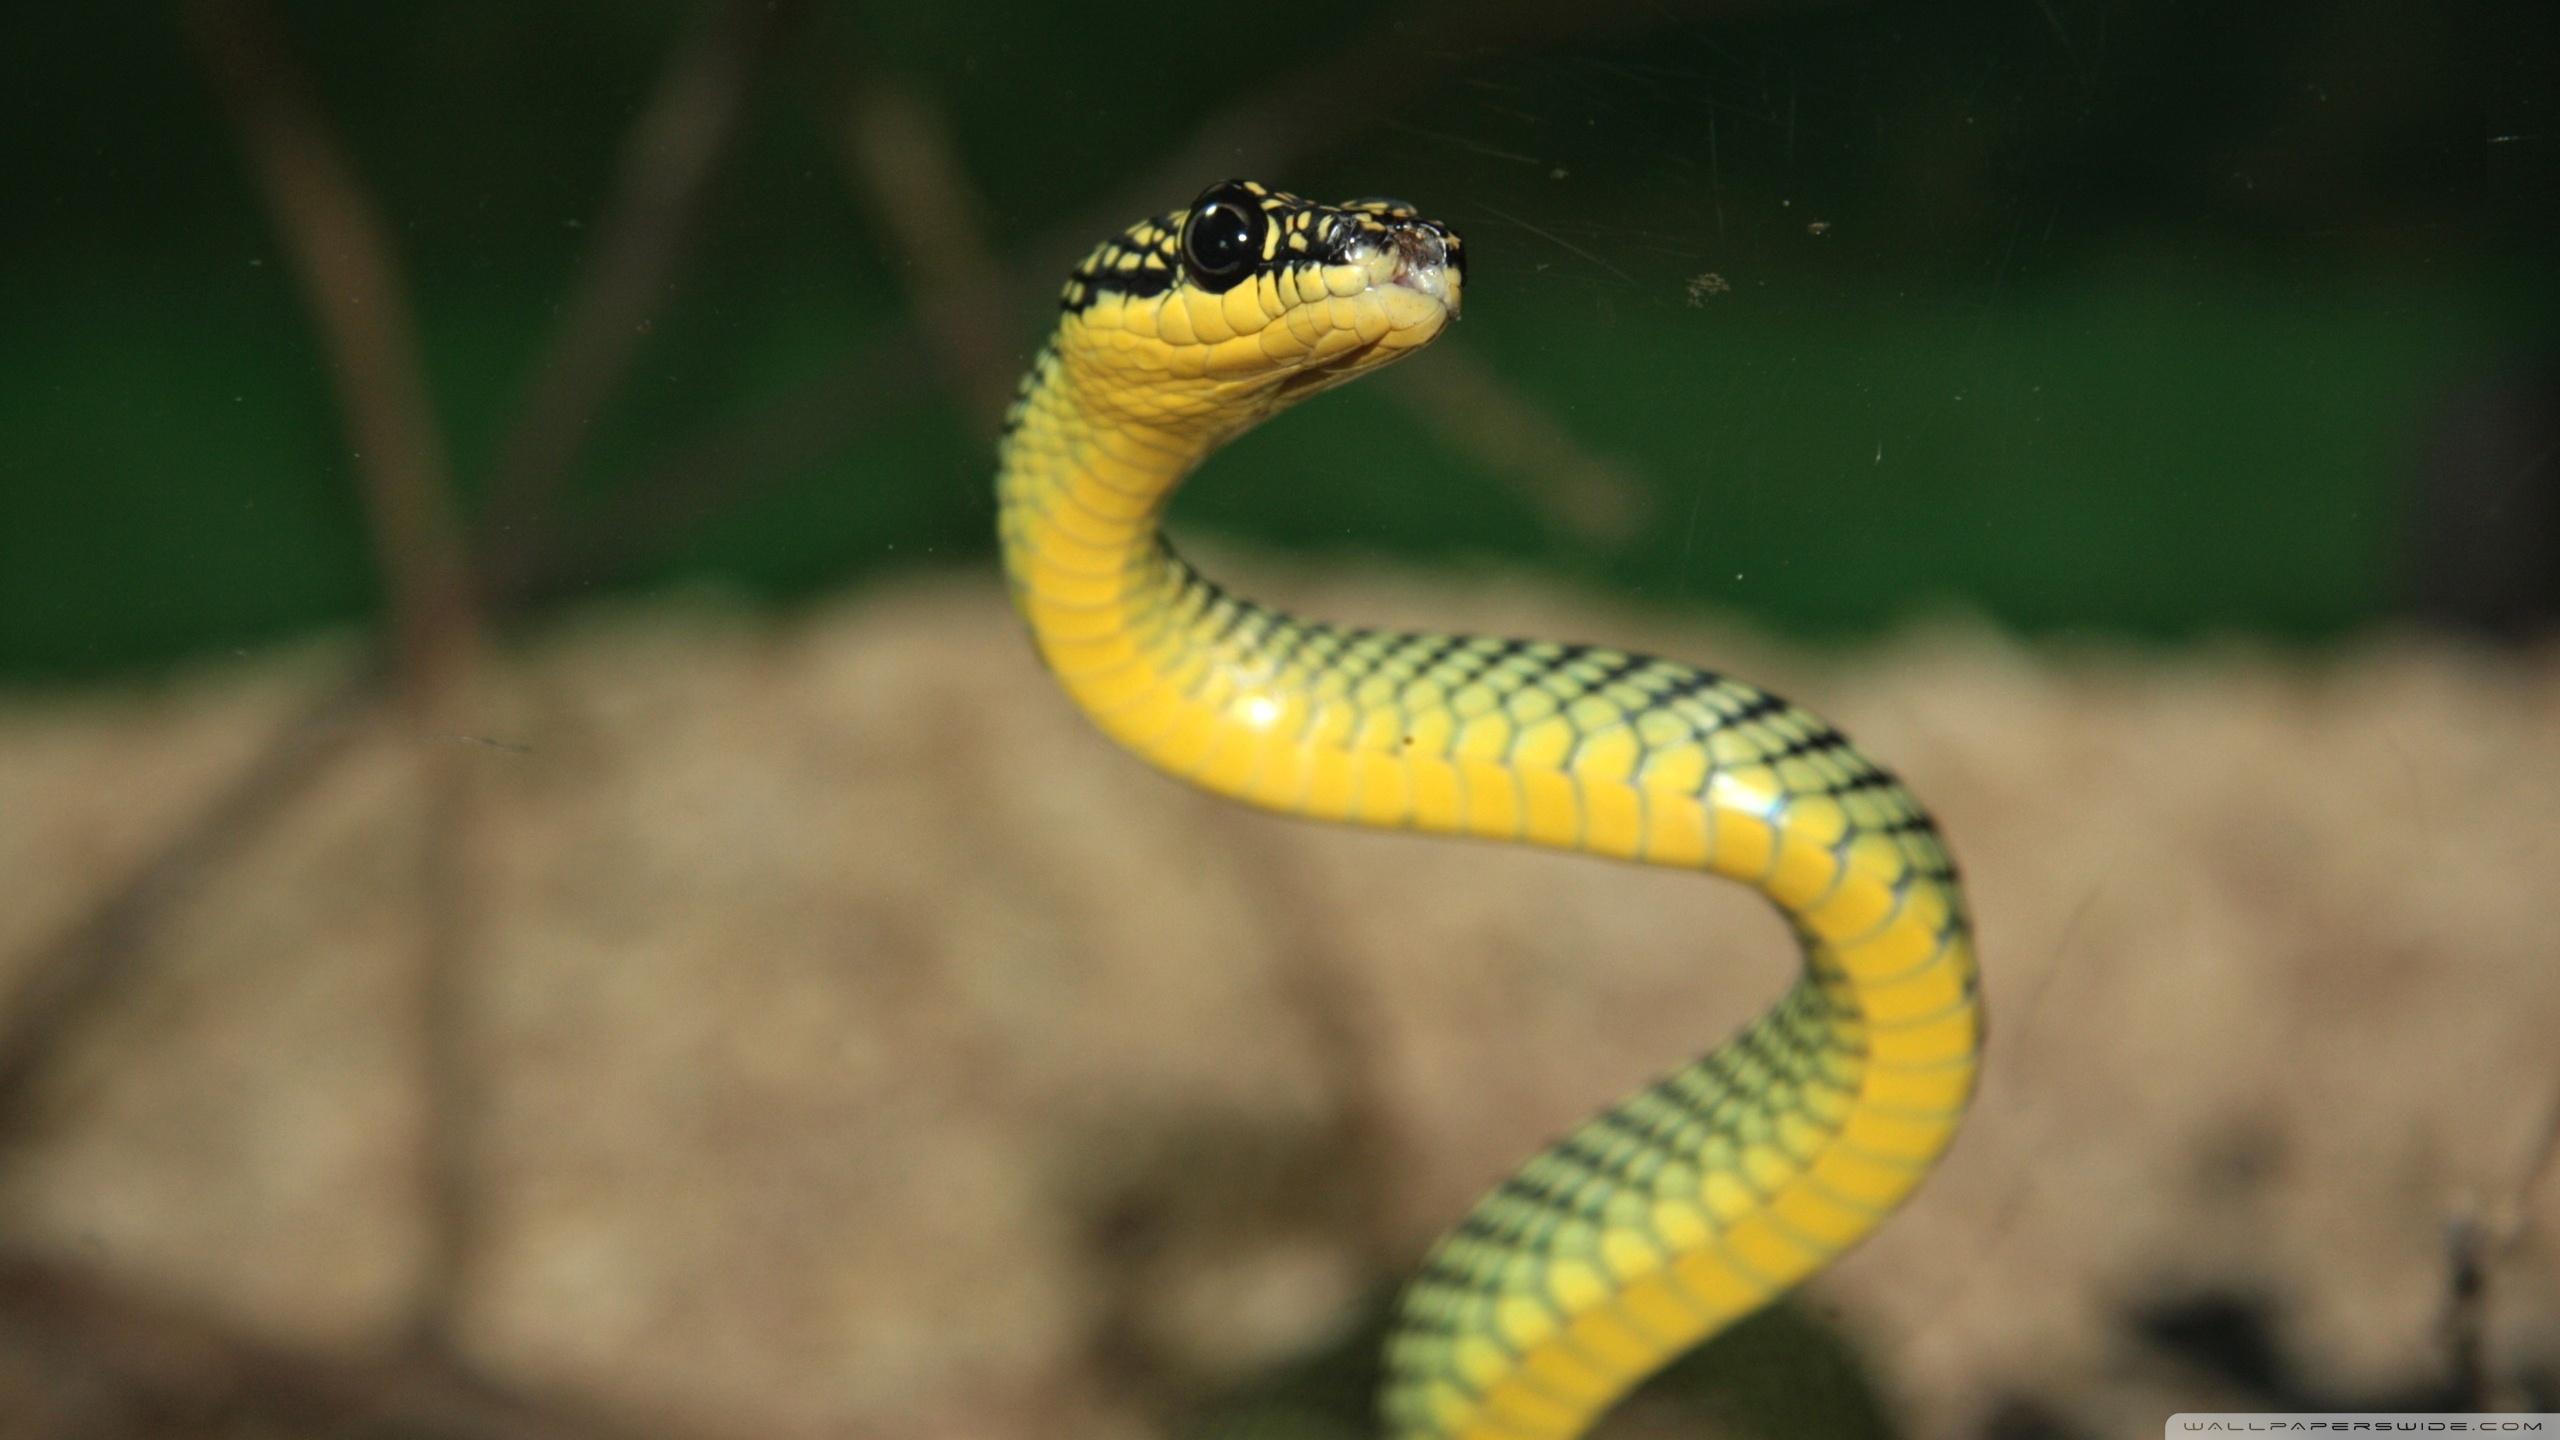 snake hd wallpaper background image 2560x1440 id 525226